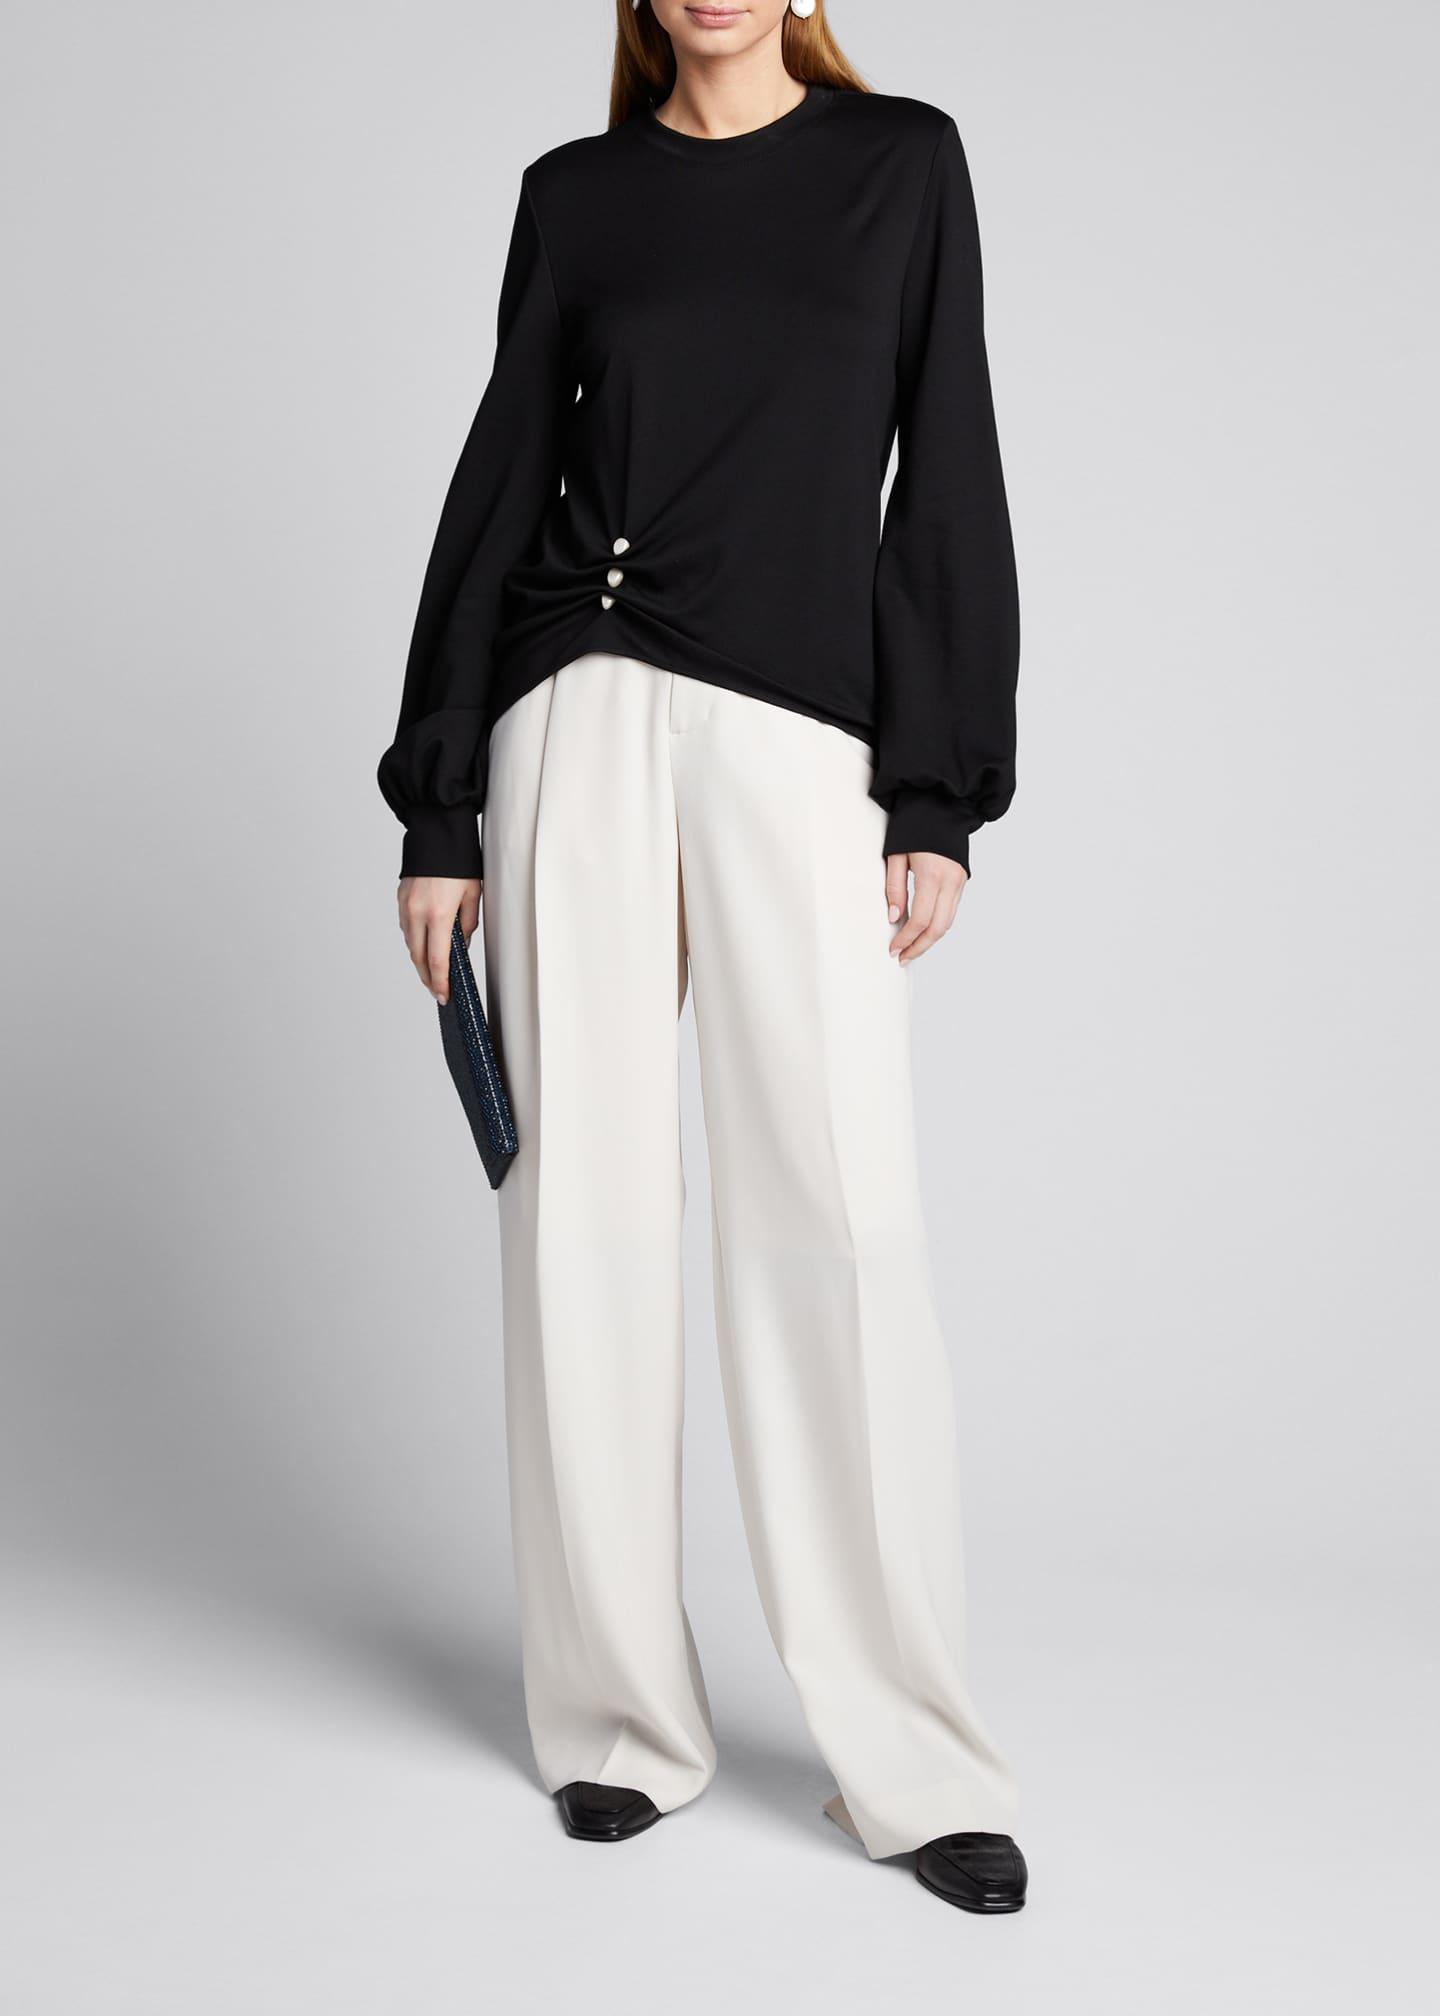 ADEAM Pearly-Sweatshirt